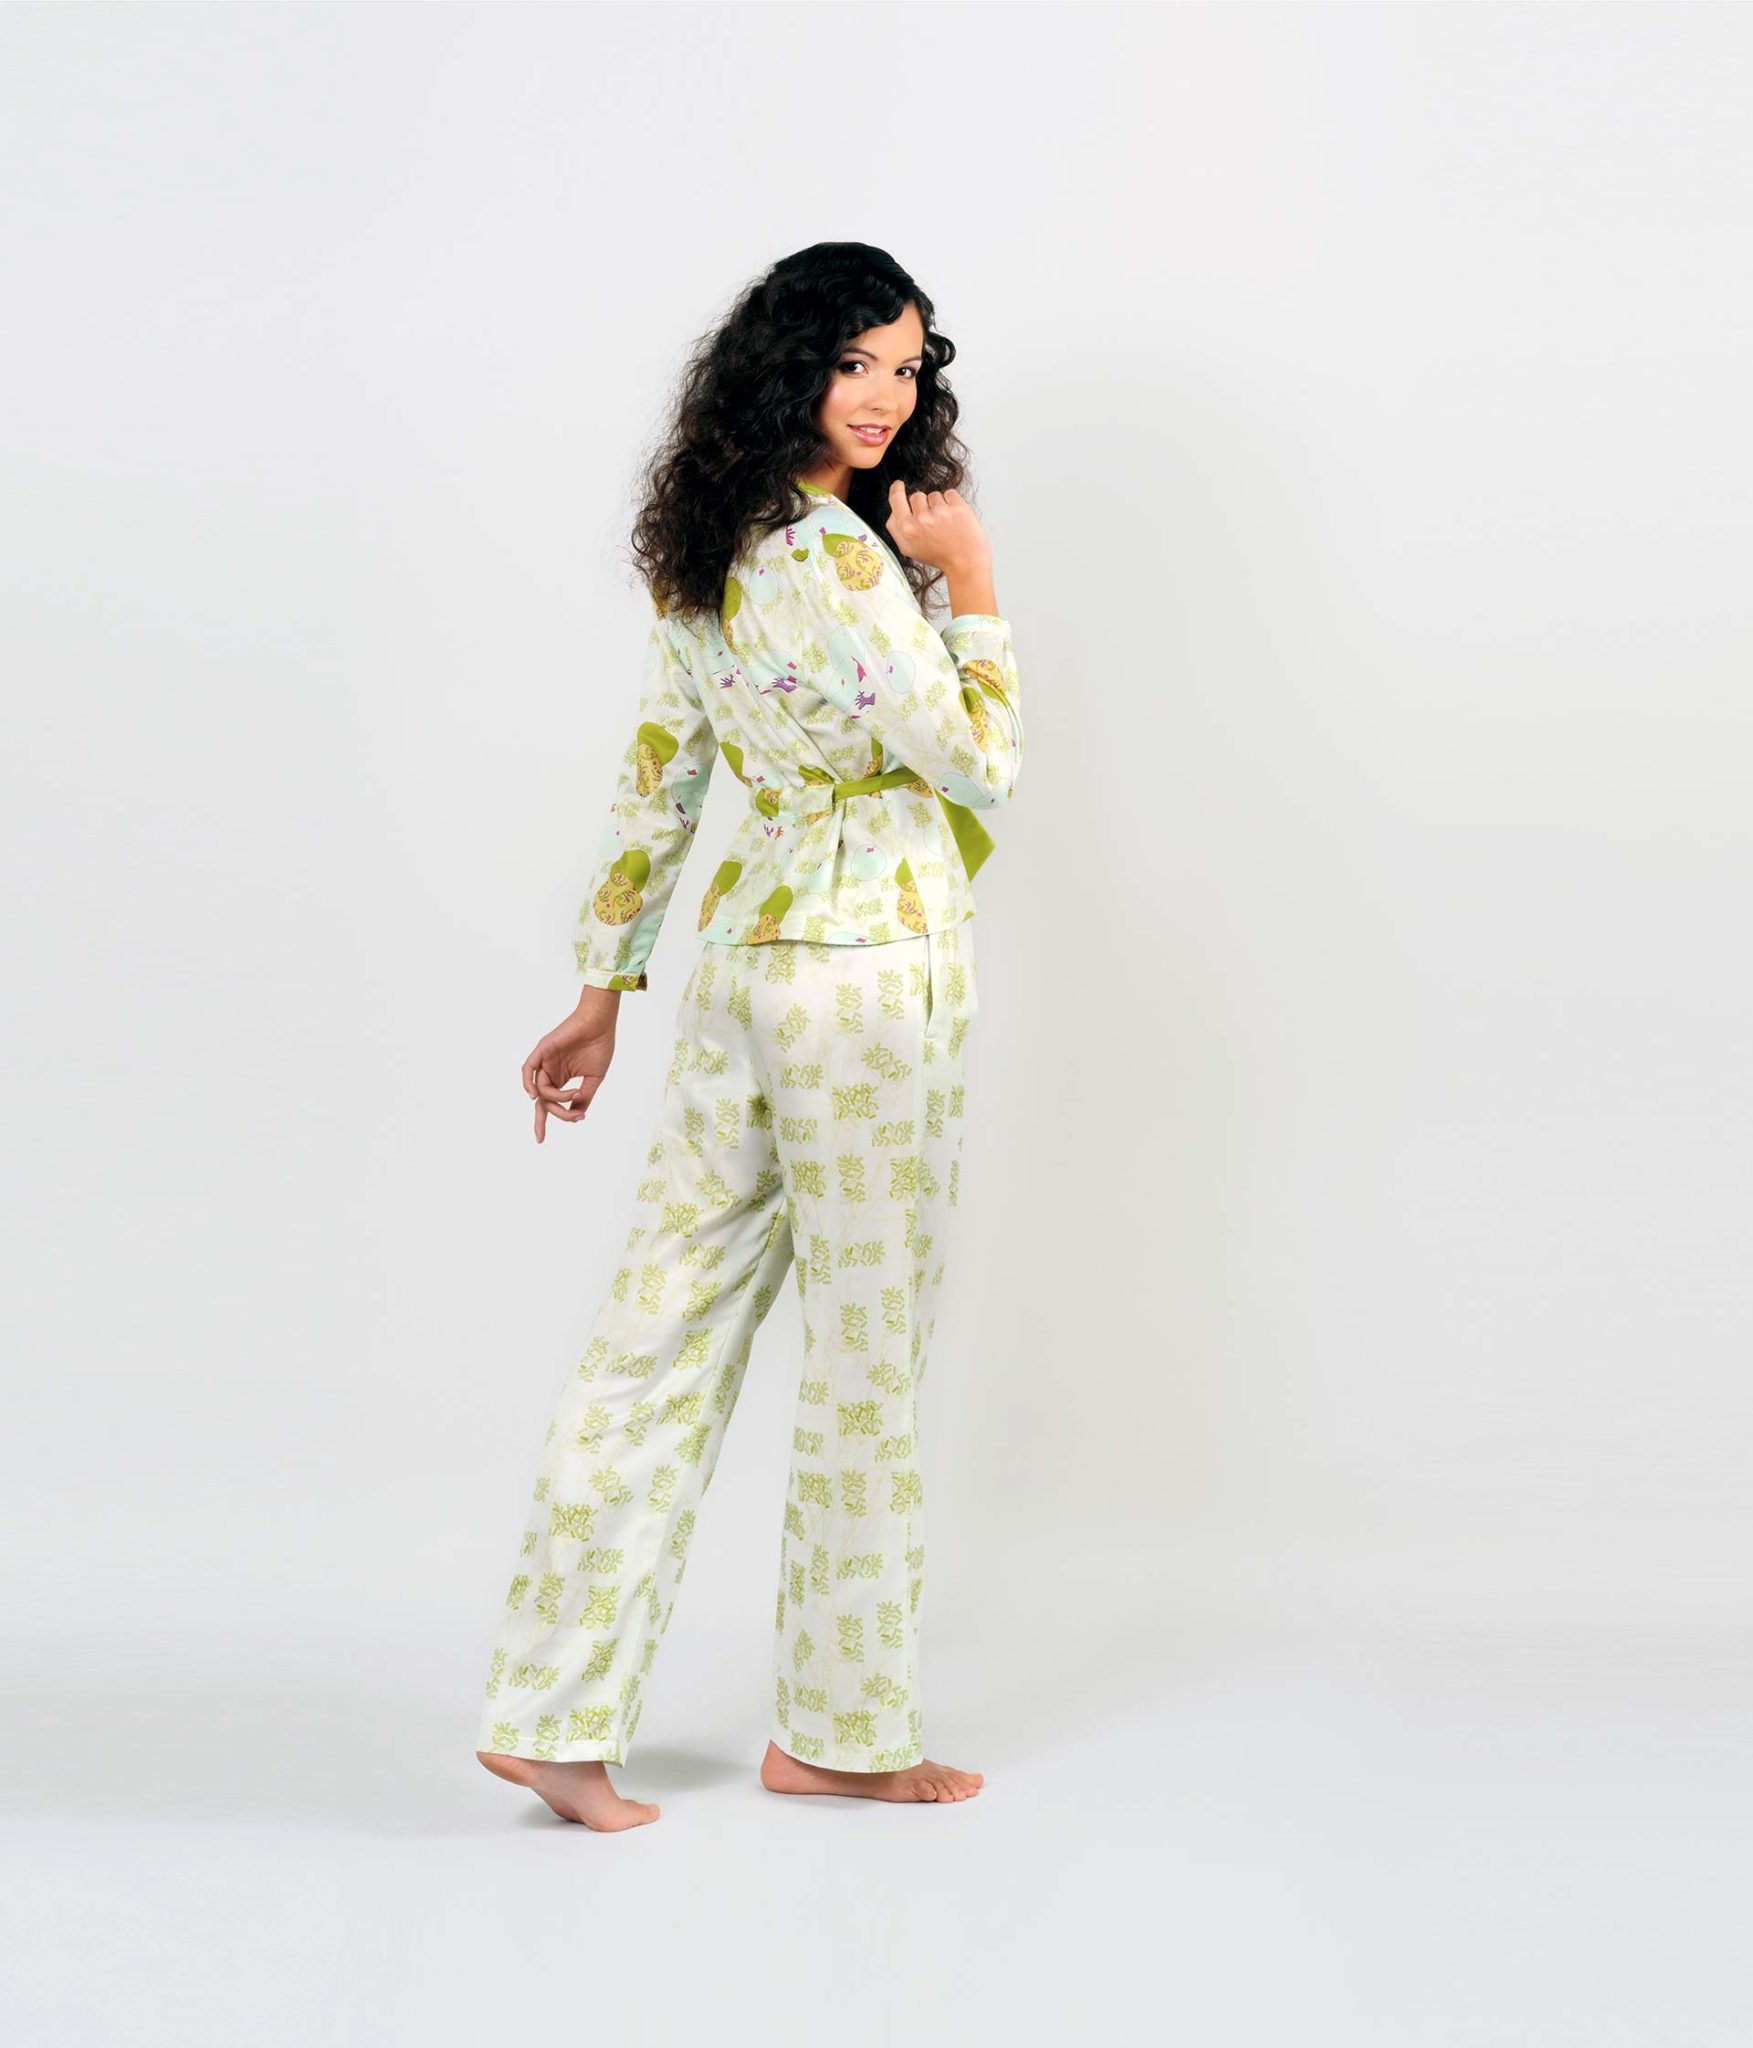 Patron pyjama femme Tulle